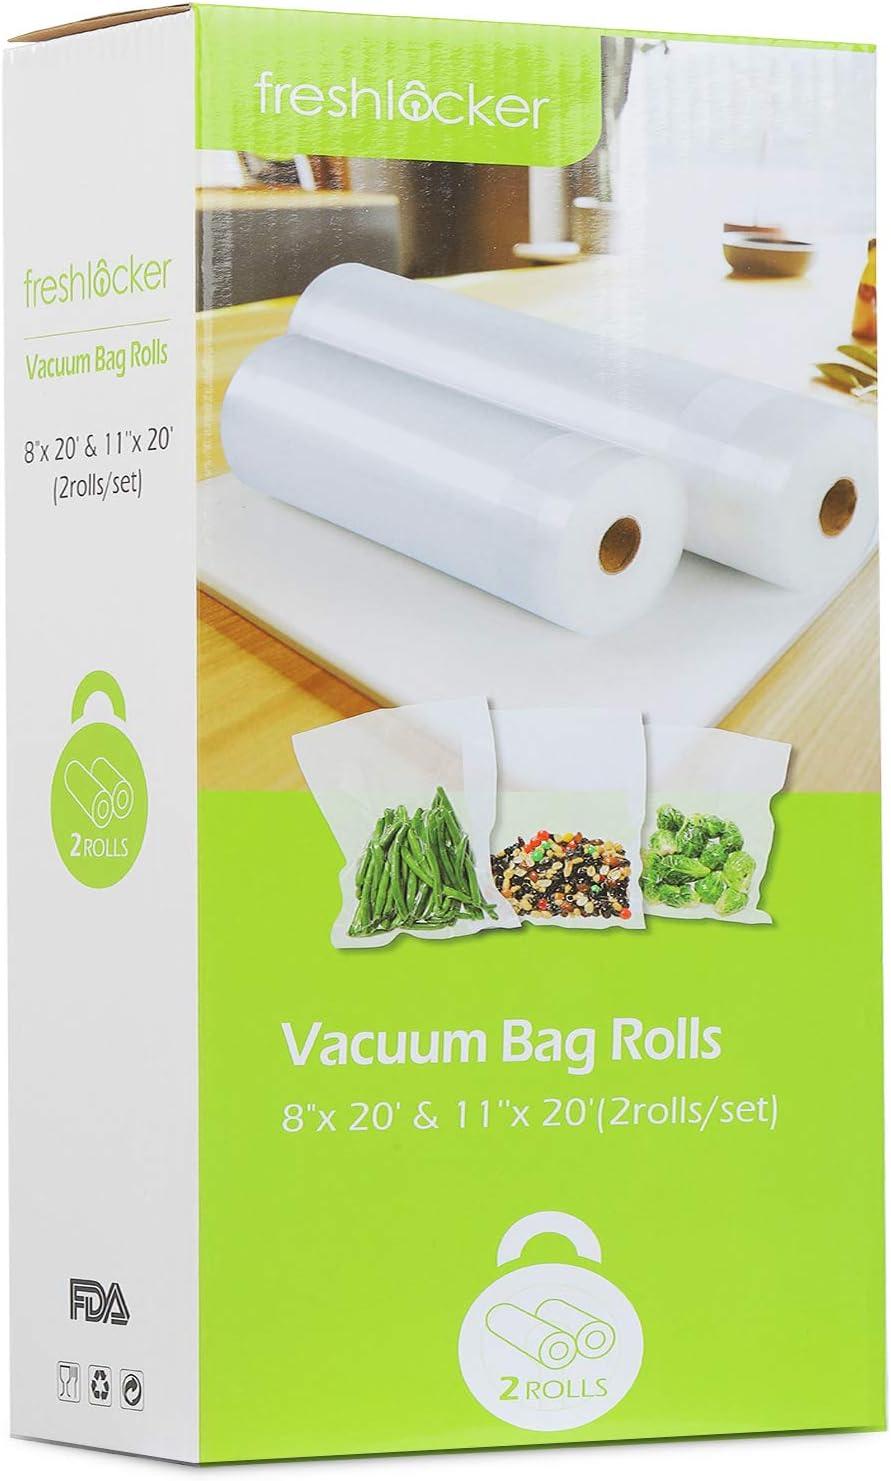 Freshlocker Vacuum Sealer Rolls, 2 Rolls 28cm X 6m & 20cm X 6m Combo Food Saver Bags Rolls for Food Preservation Sous Vide Cooking and All Vacuum Sealer Machine, Reusable BPA Commercial Grade